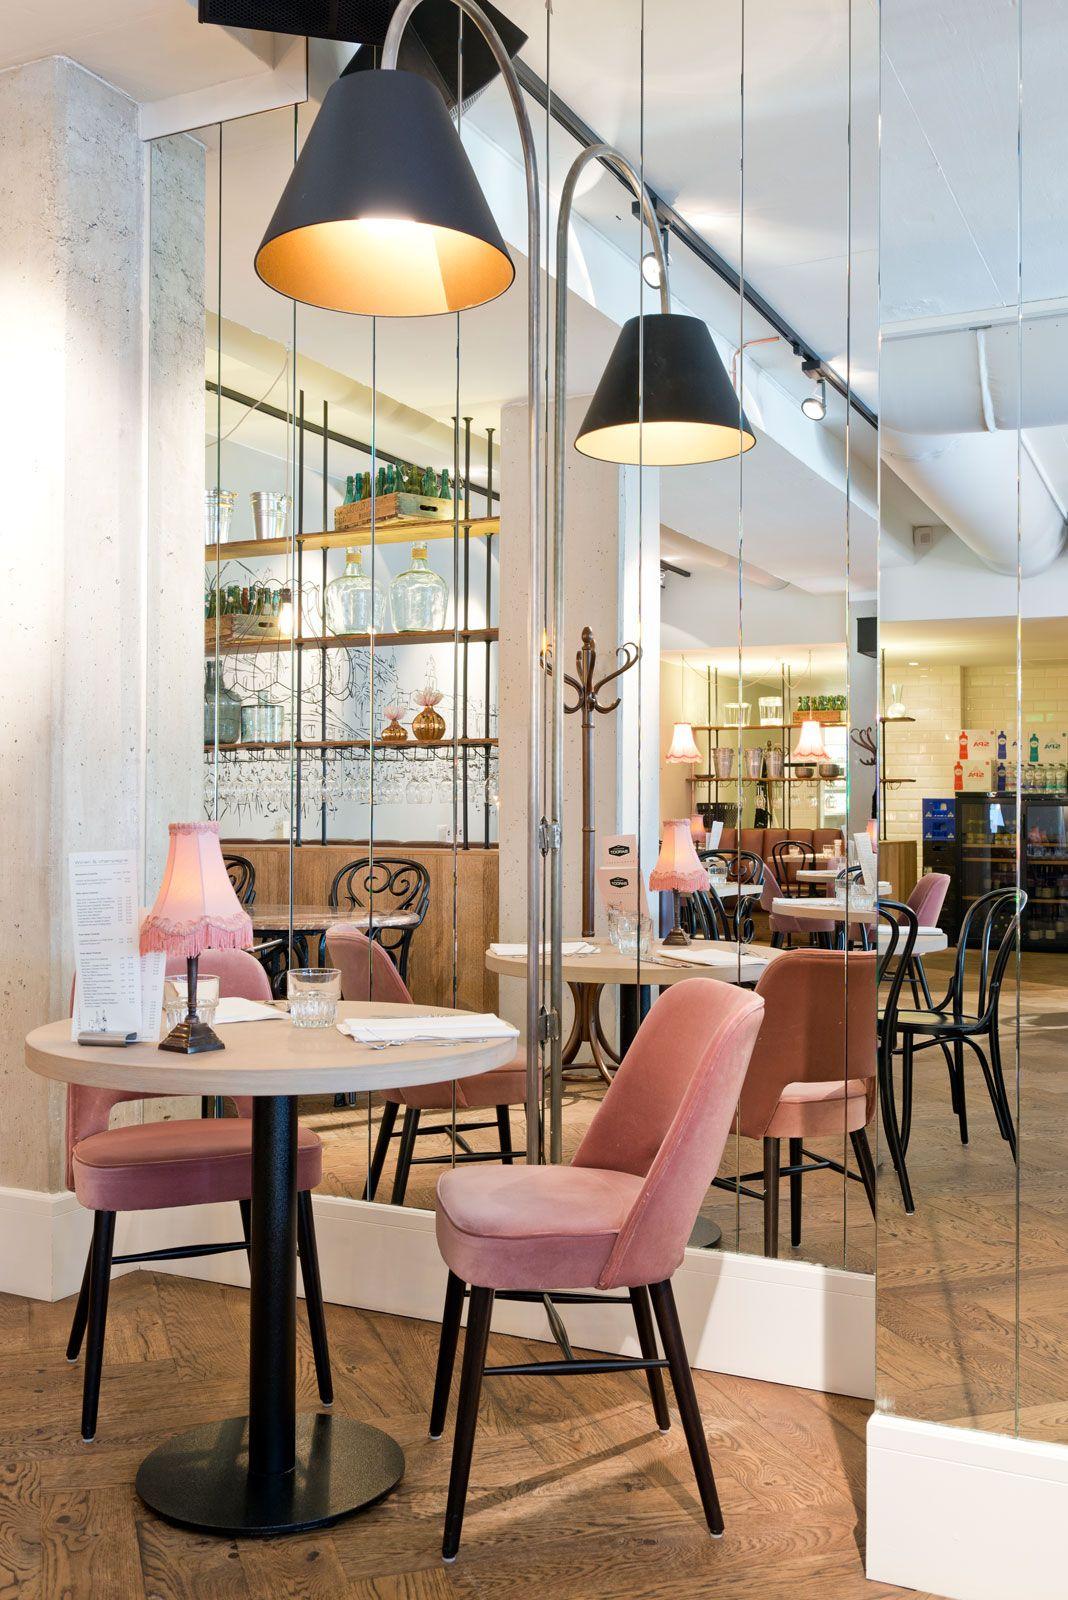 Brasserie bardot restaurant love the mid century style